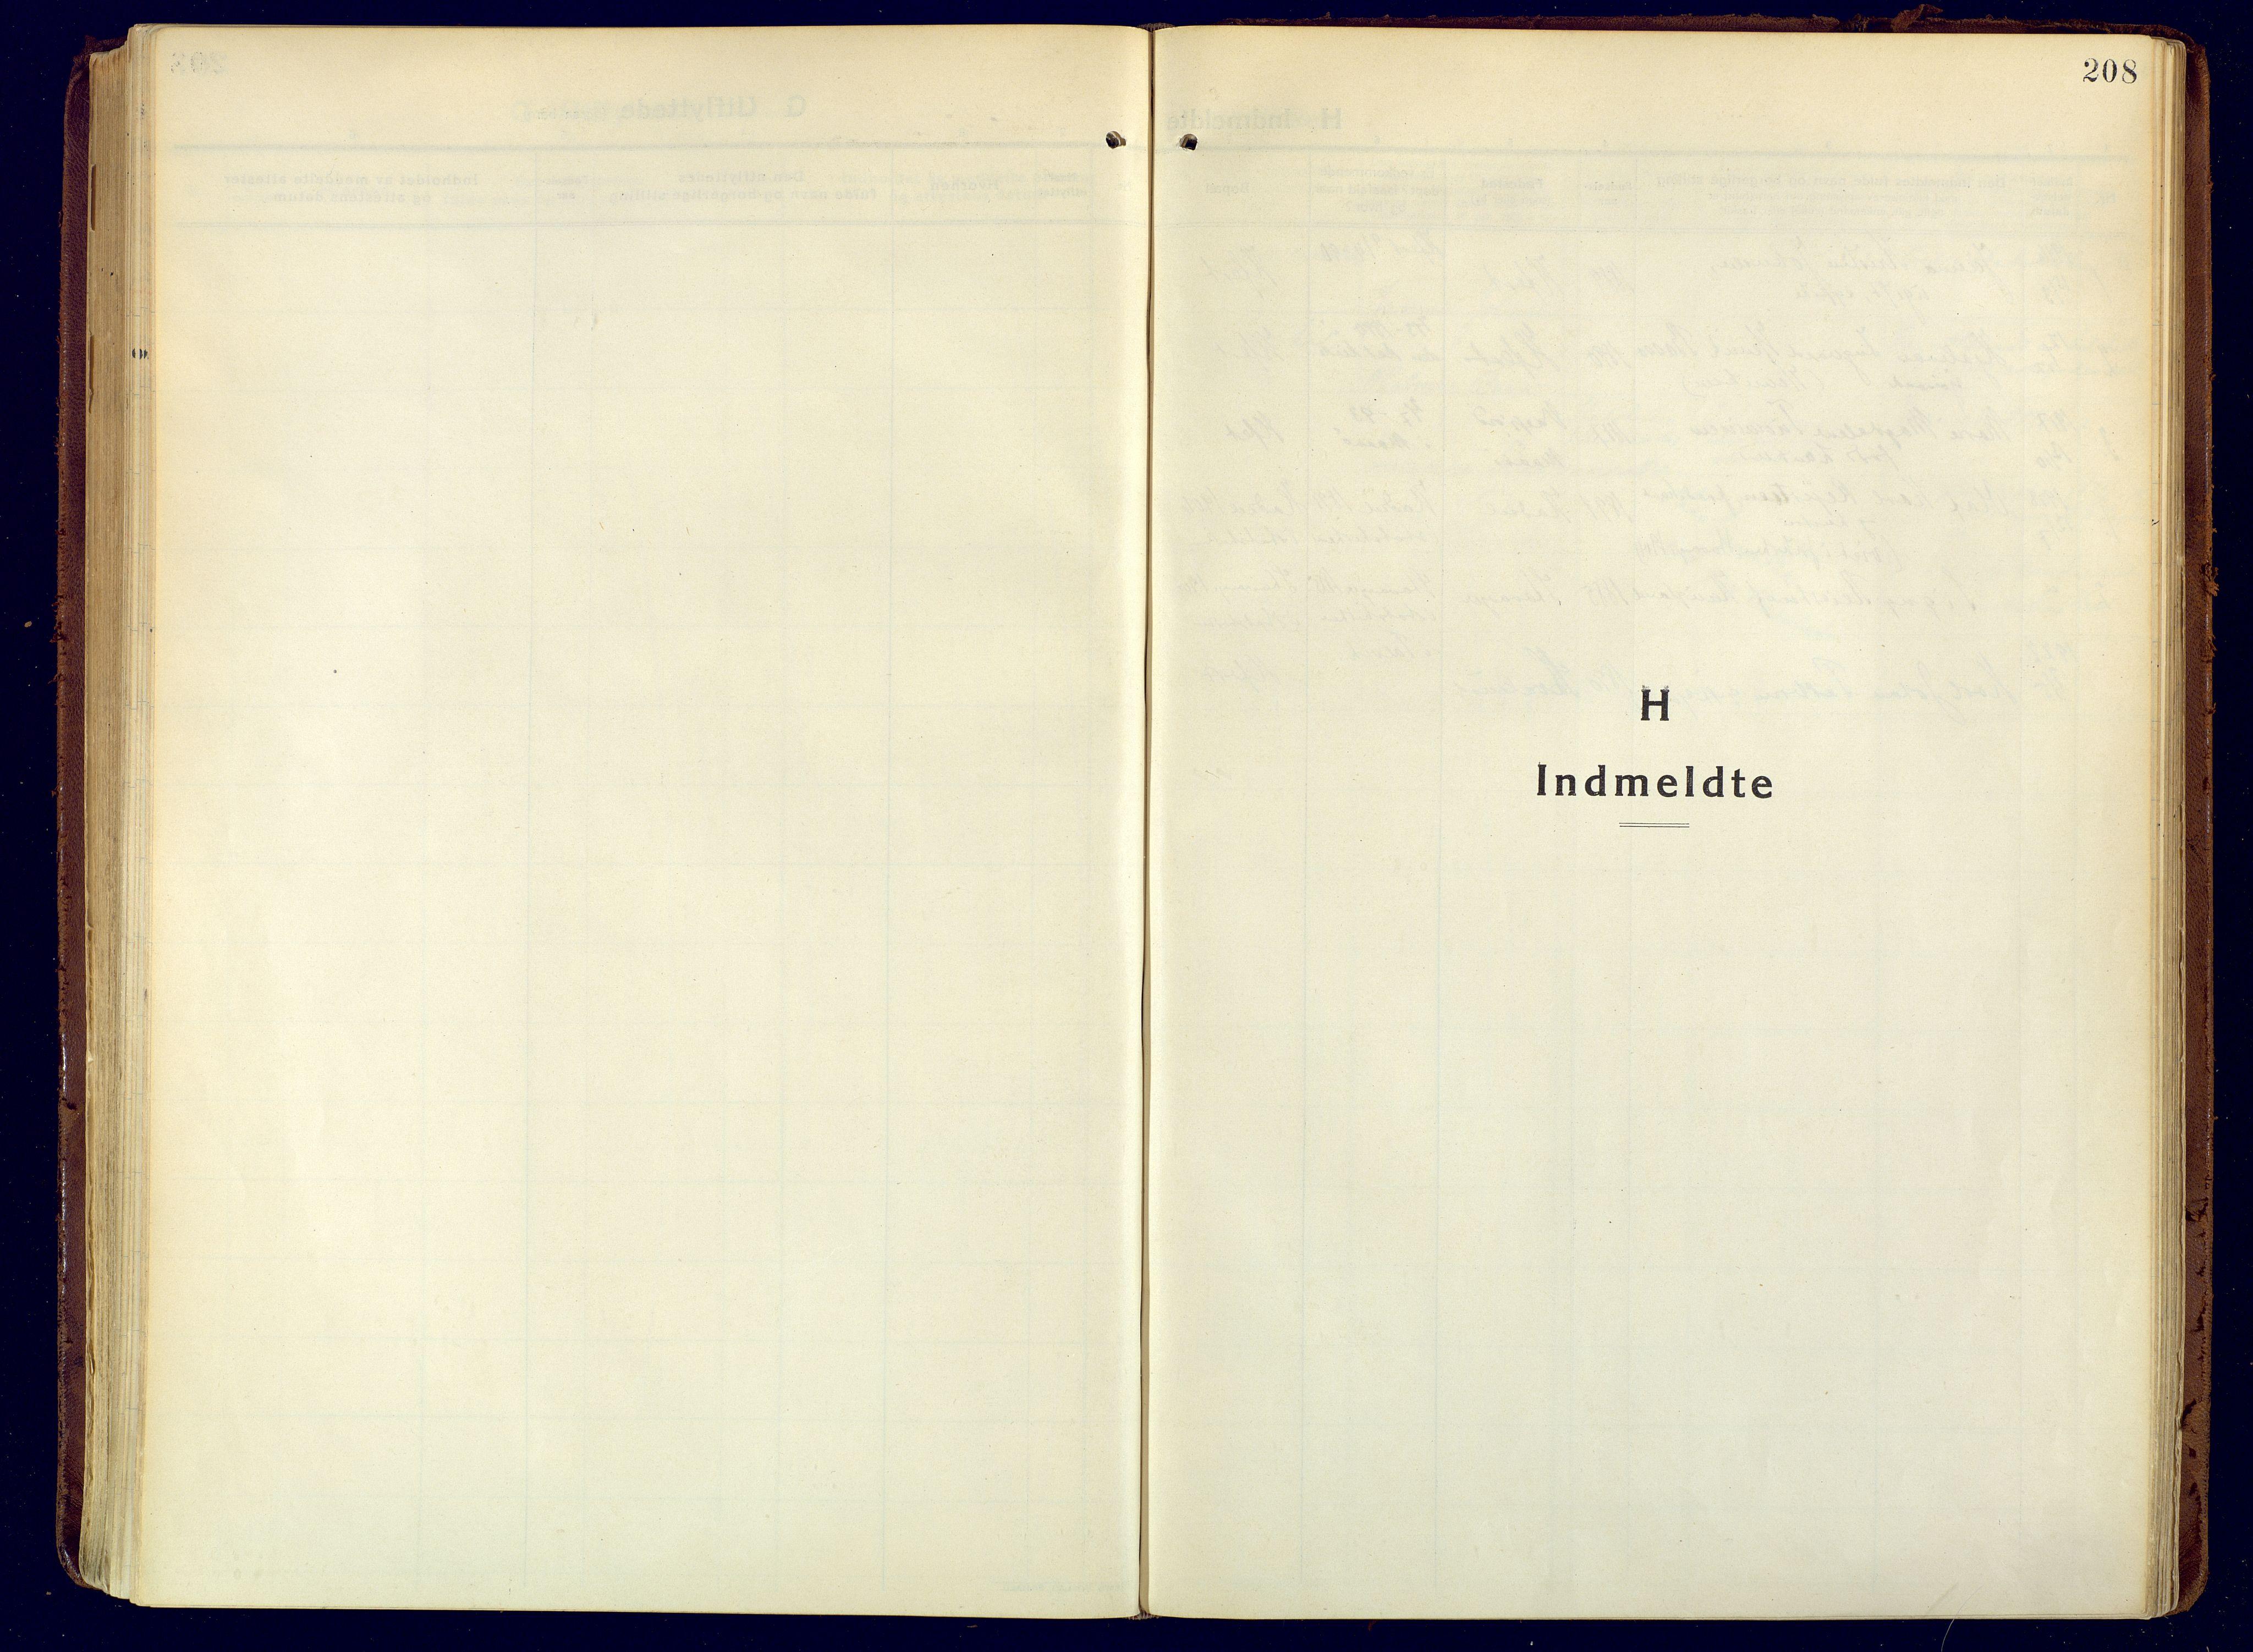 SATØ, Hammerfest sokneprestembete, Ministerialbok nr. 15, 1916-1923, s. 208